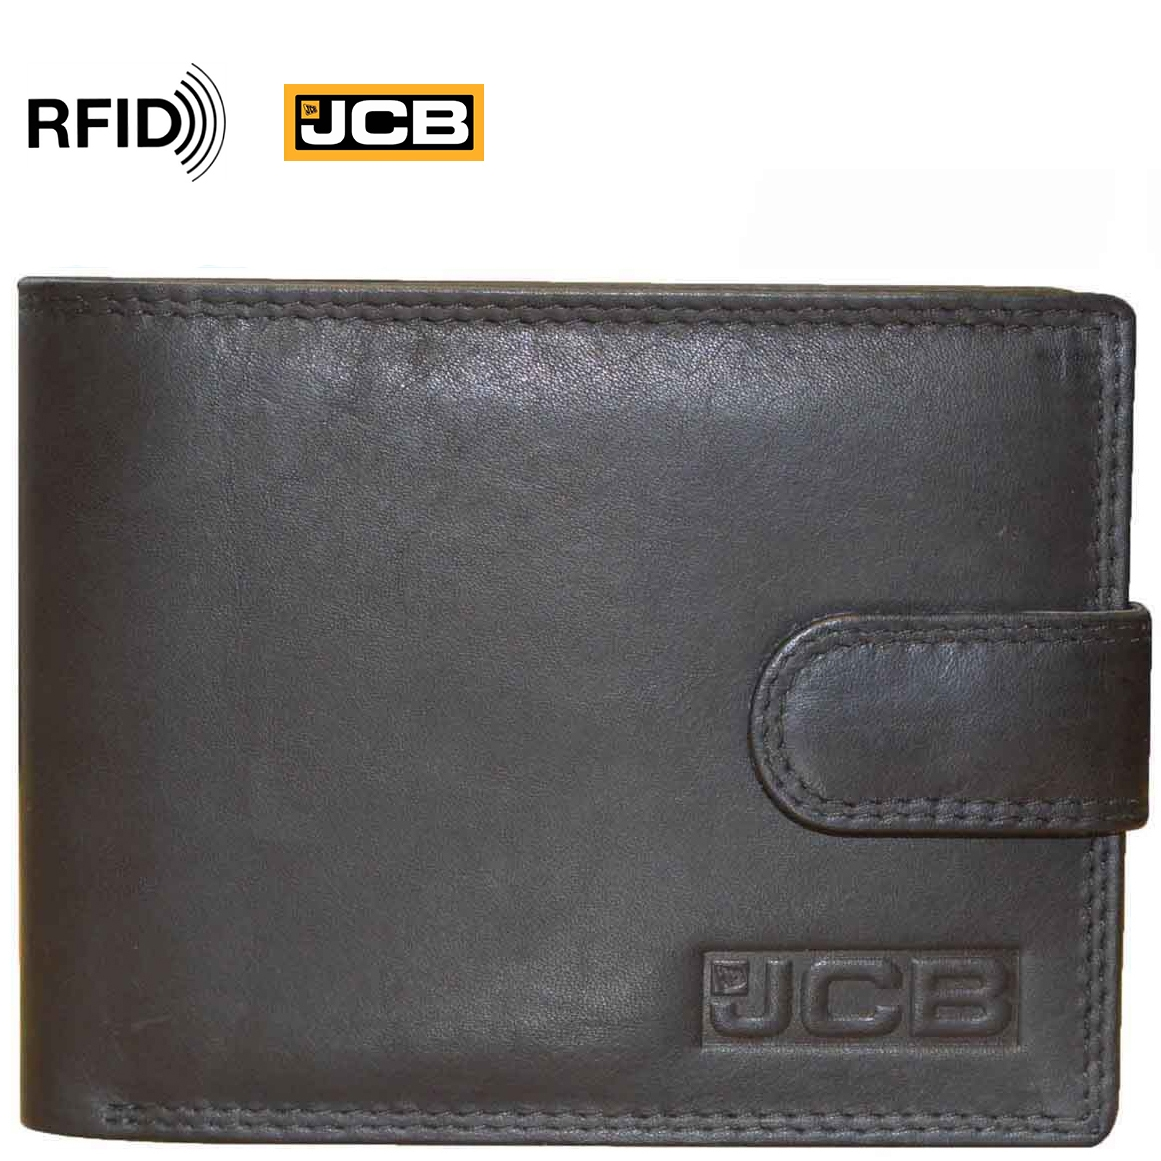 Jcb Mens Credit Card Wallet: JCB Mens Wallet